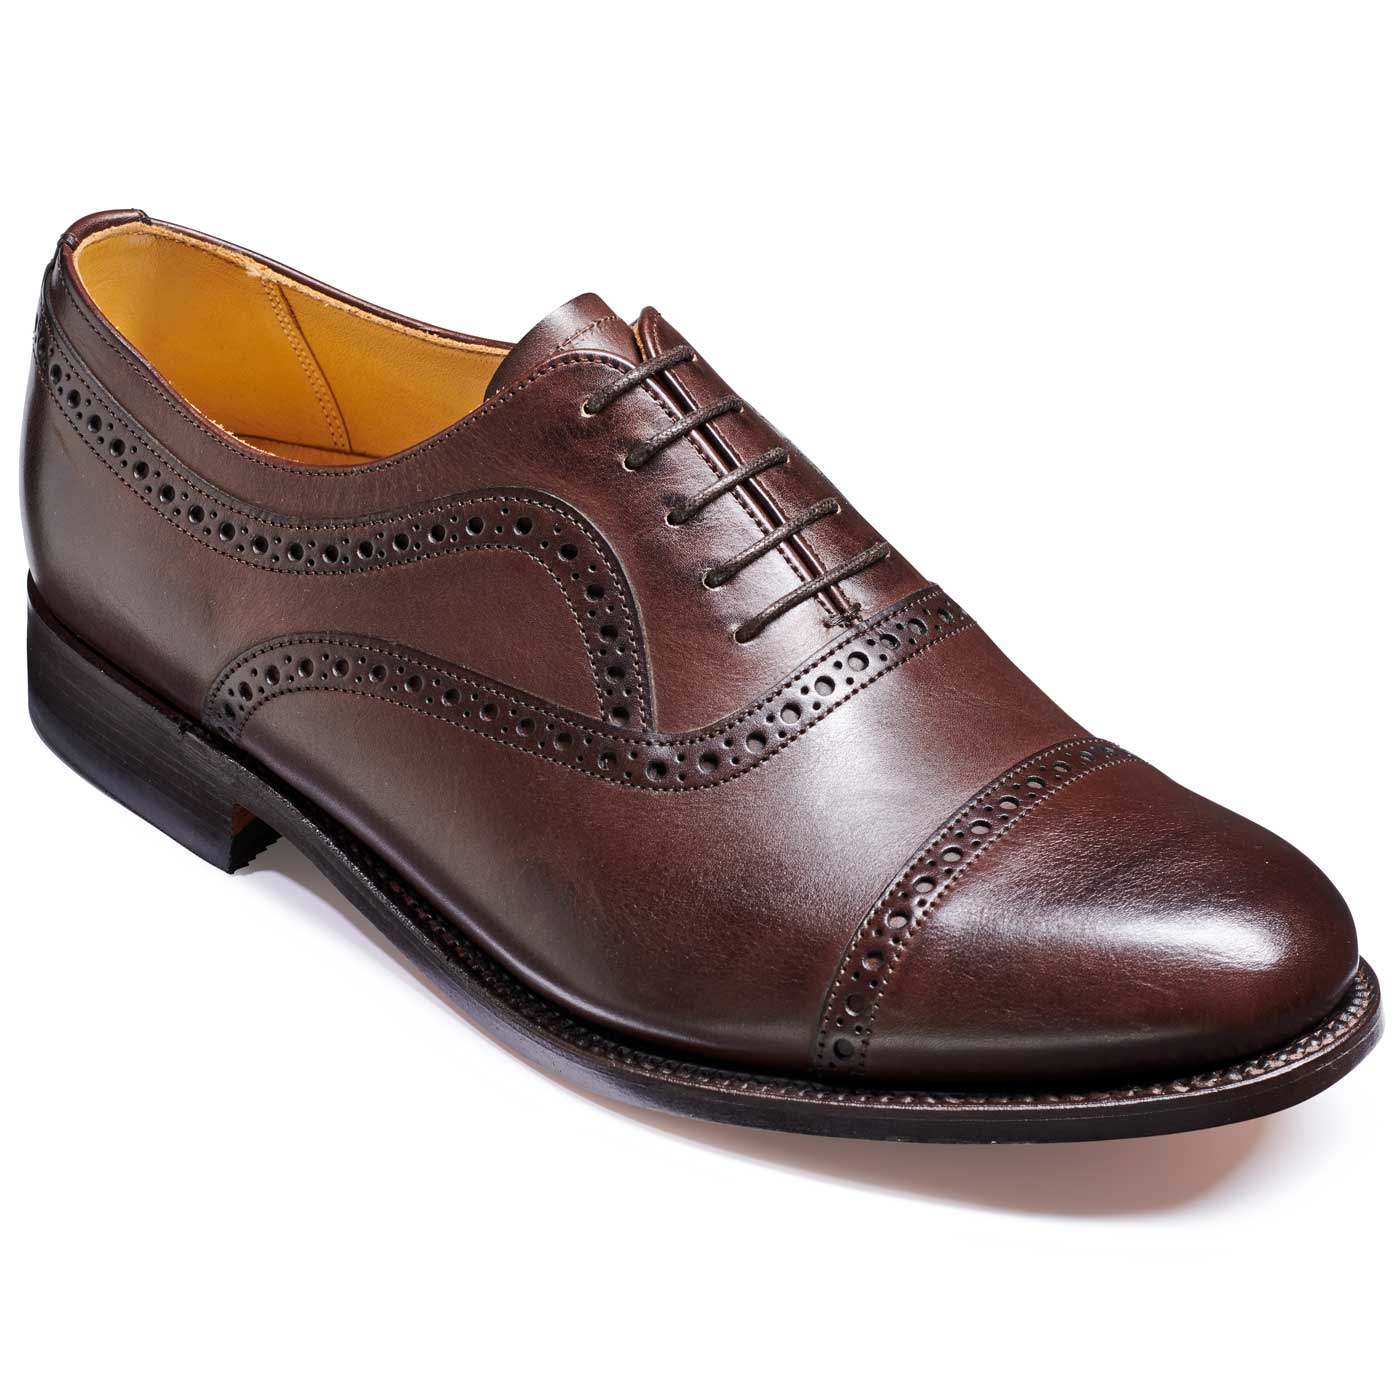 6cec0fafa69e66 Barker Southampton Shoes - Oxford Semi Brogue - Dark Walnut Calf